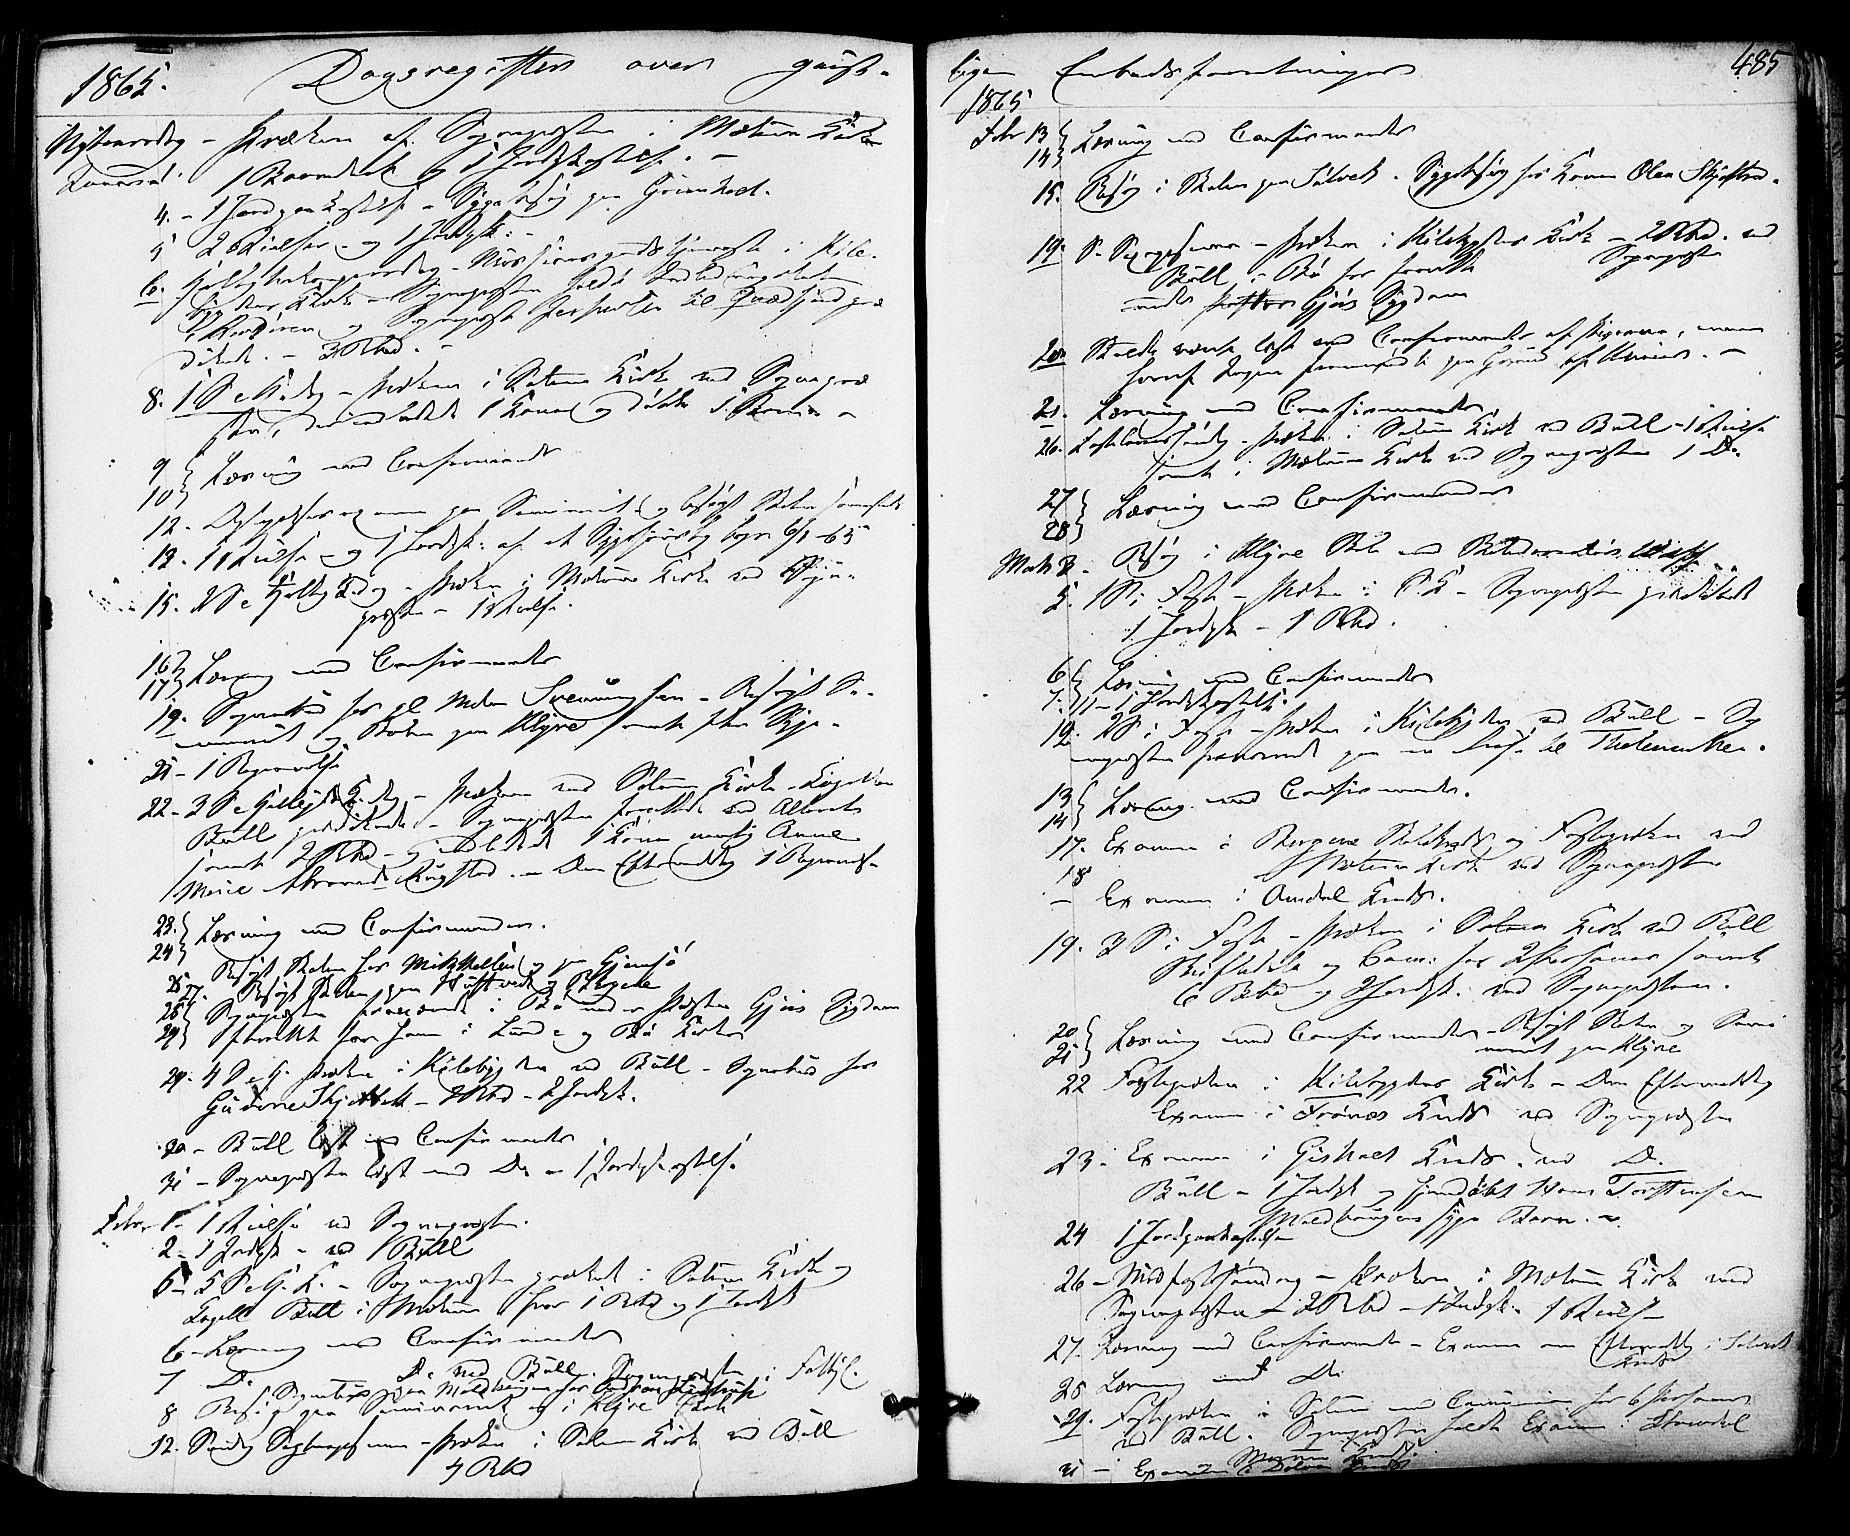 SAKO, Solum kirkebøker, F/Fa/L0008: Ministerialbok nr. I 8, 1865-1876, s. 485